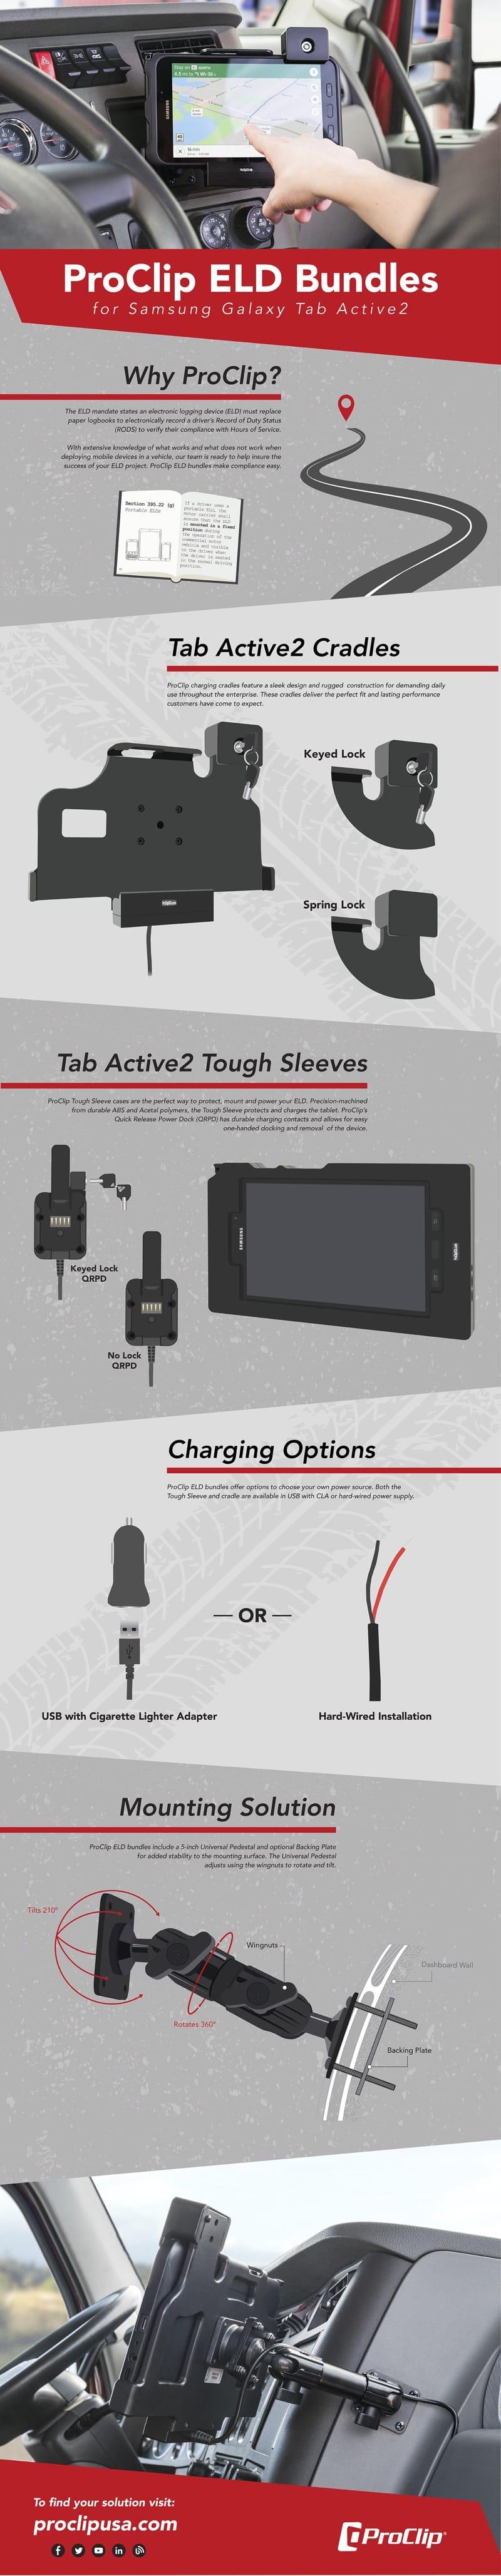 Tab Active2